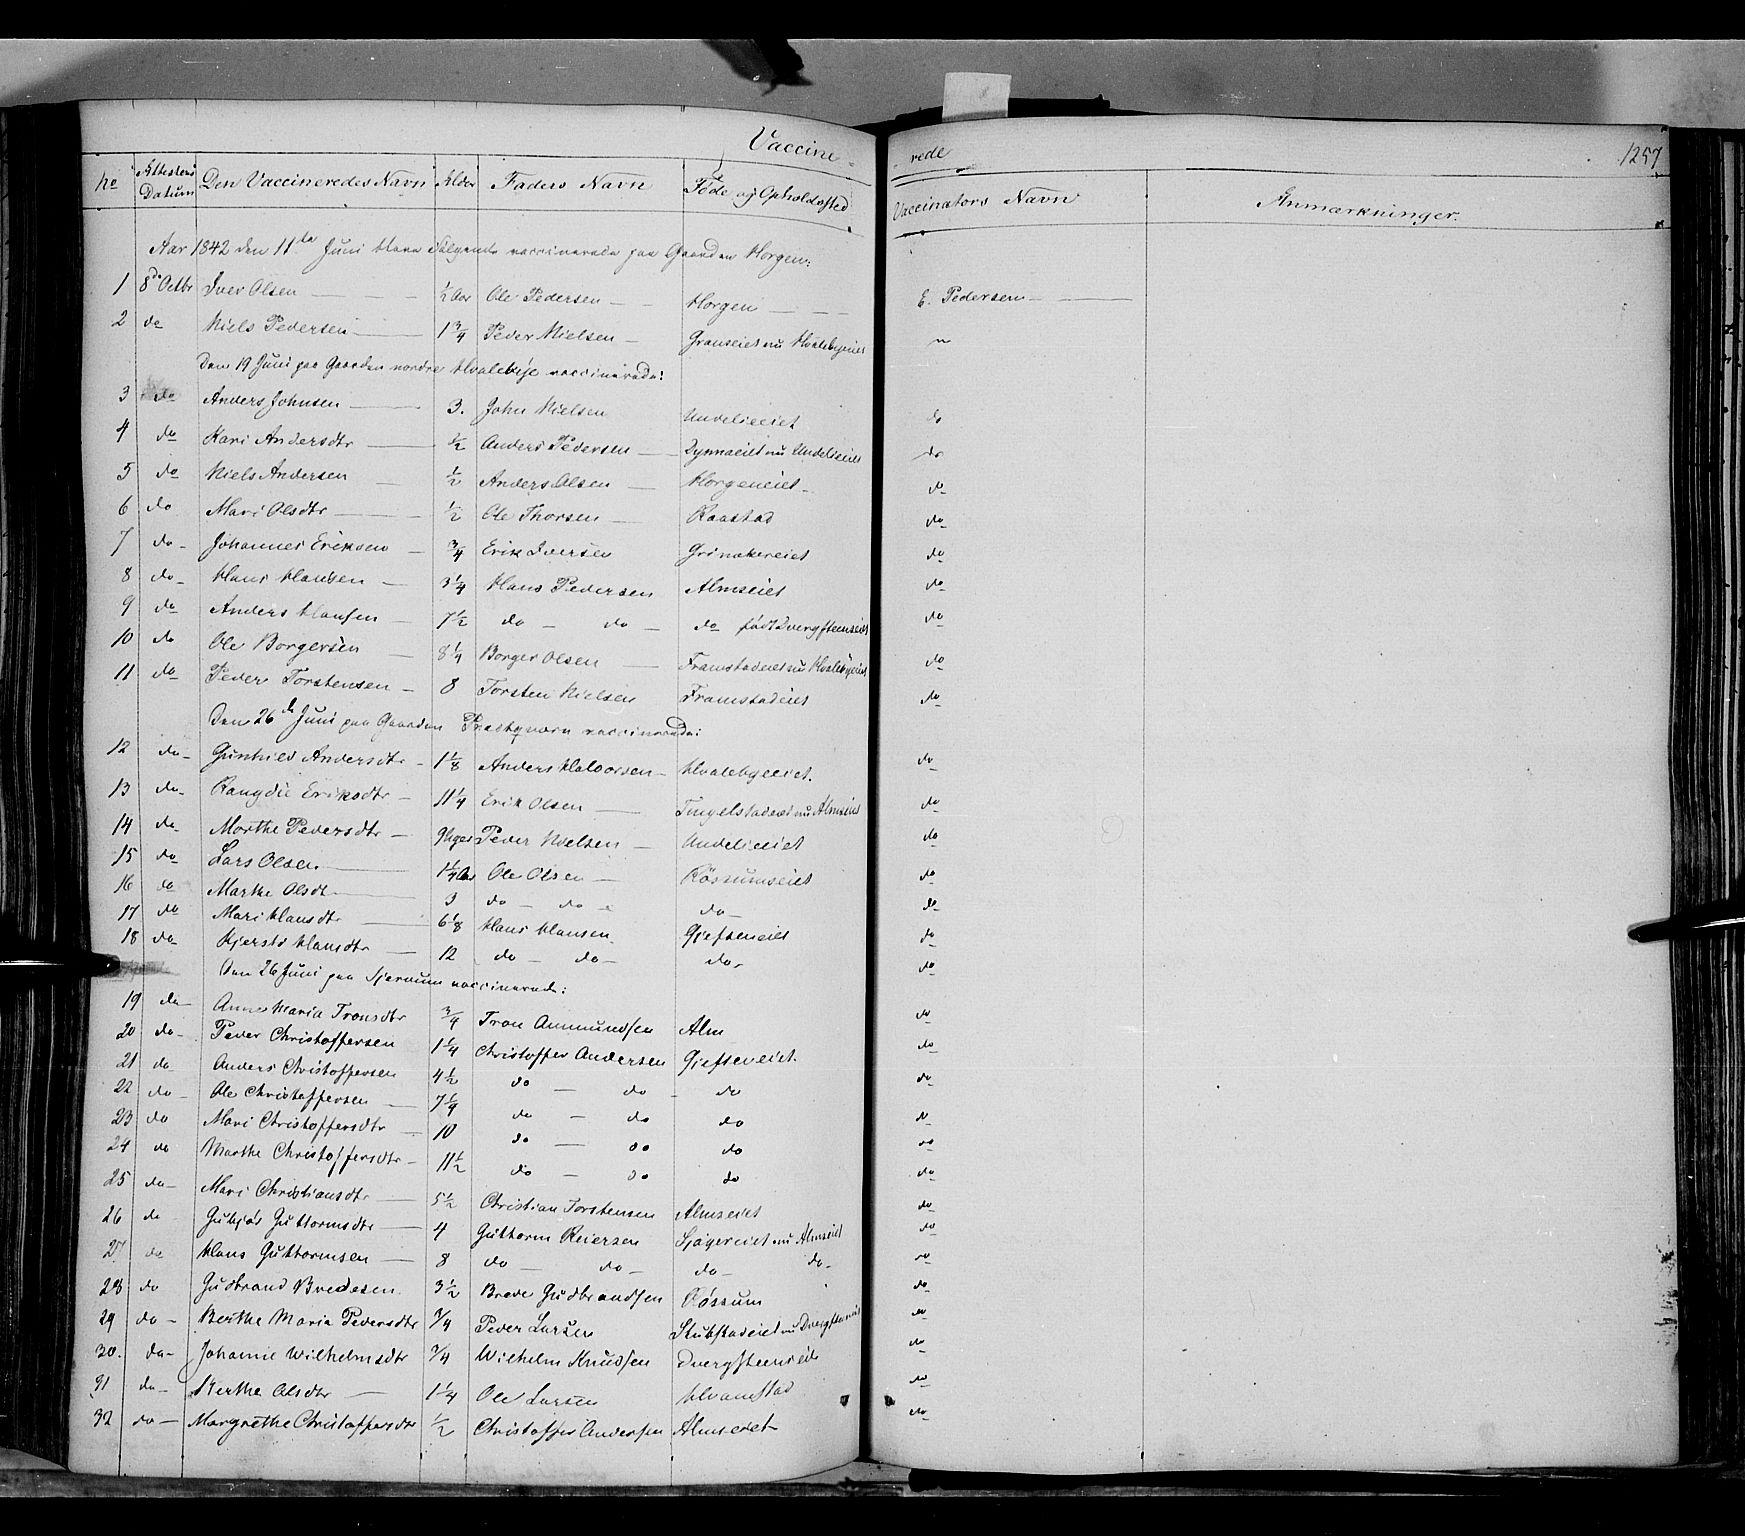 SAH, Gran prestekontor, Ministerialbok nr. 11, 1842-1856, s. 1256-1257